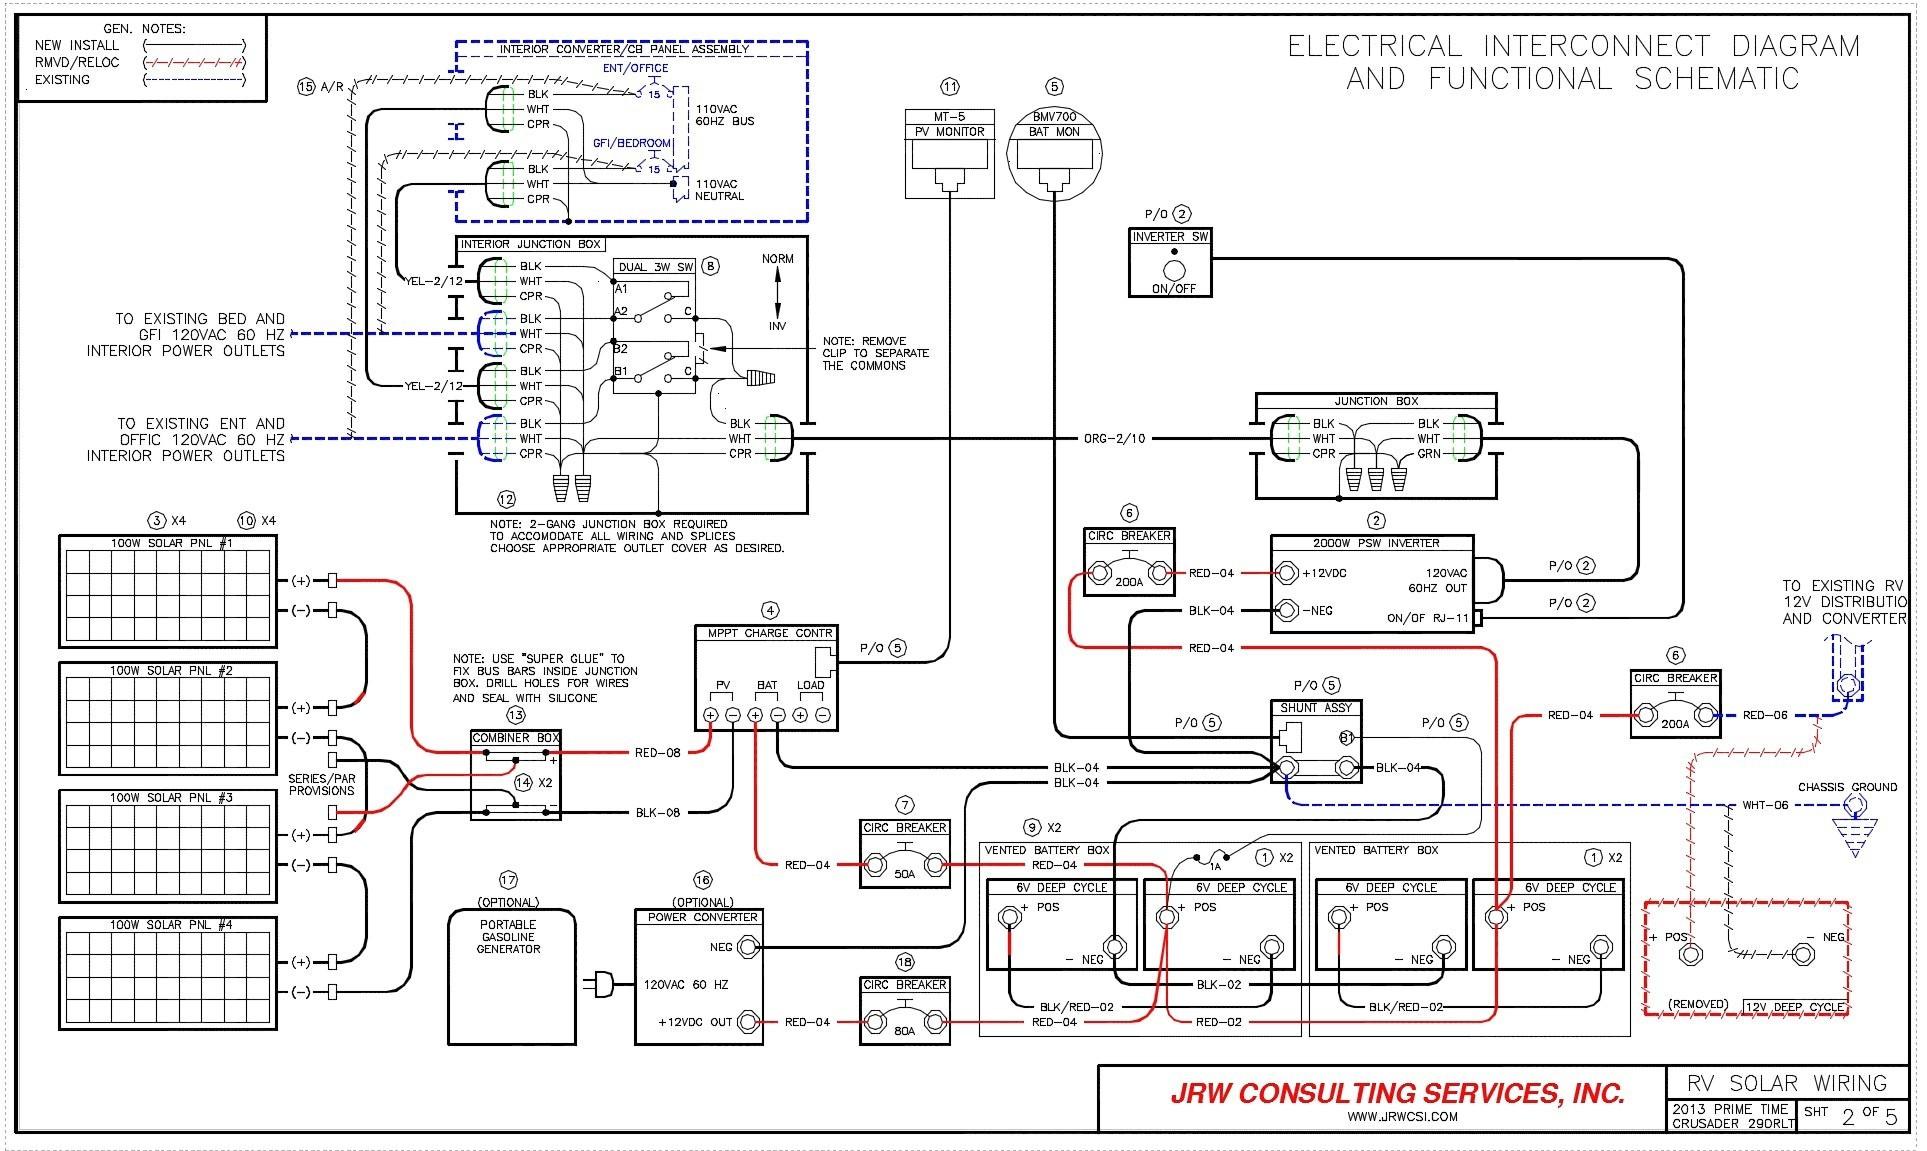 12v wiring diagram motorhome fresh wiring diagram for rv electrical 12v solar panel wiring diagram 12v